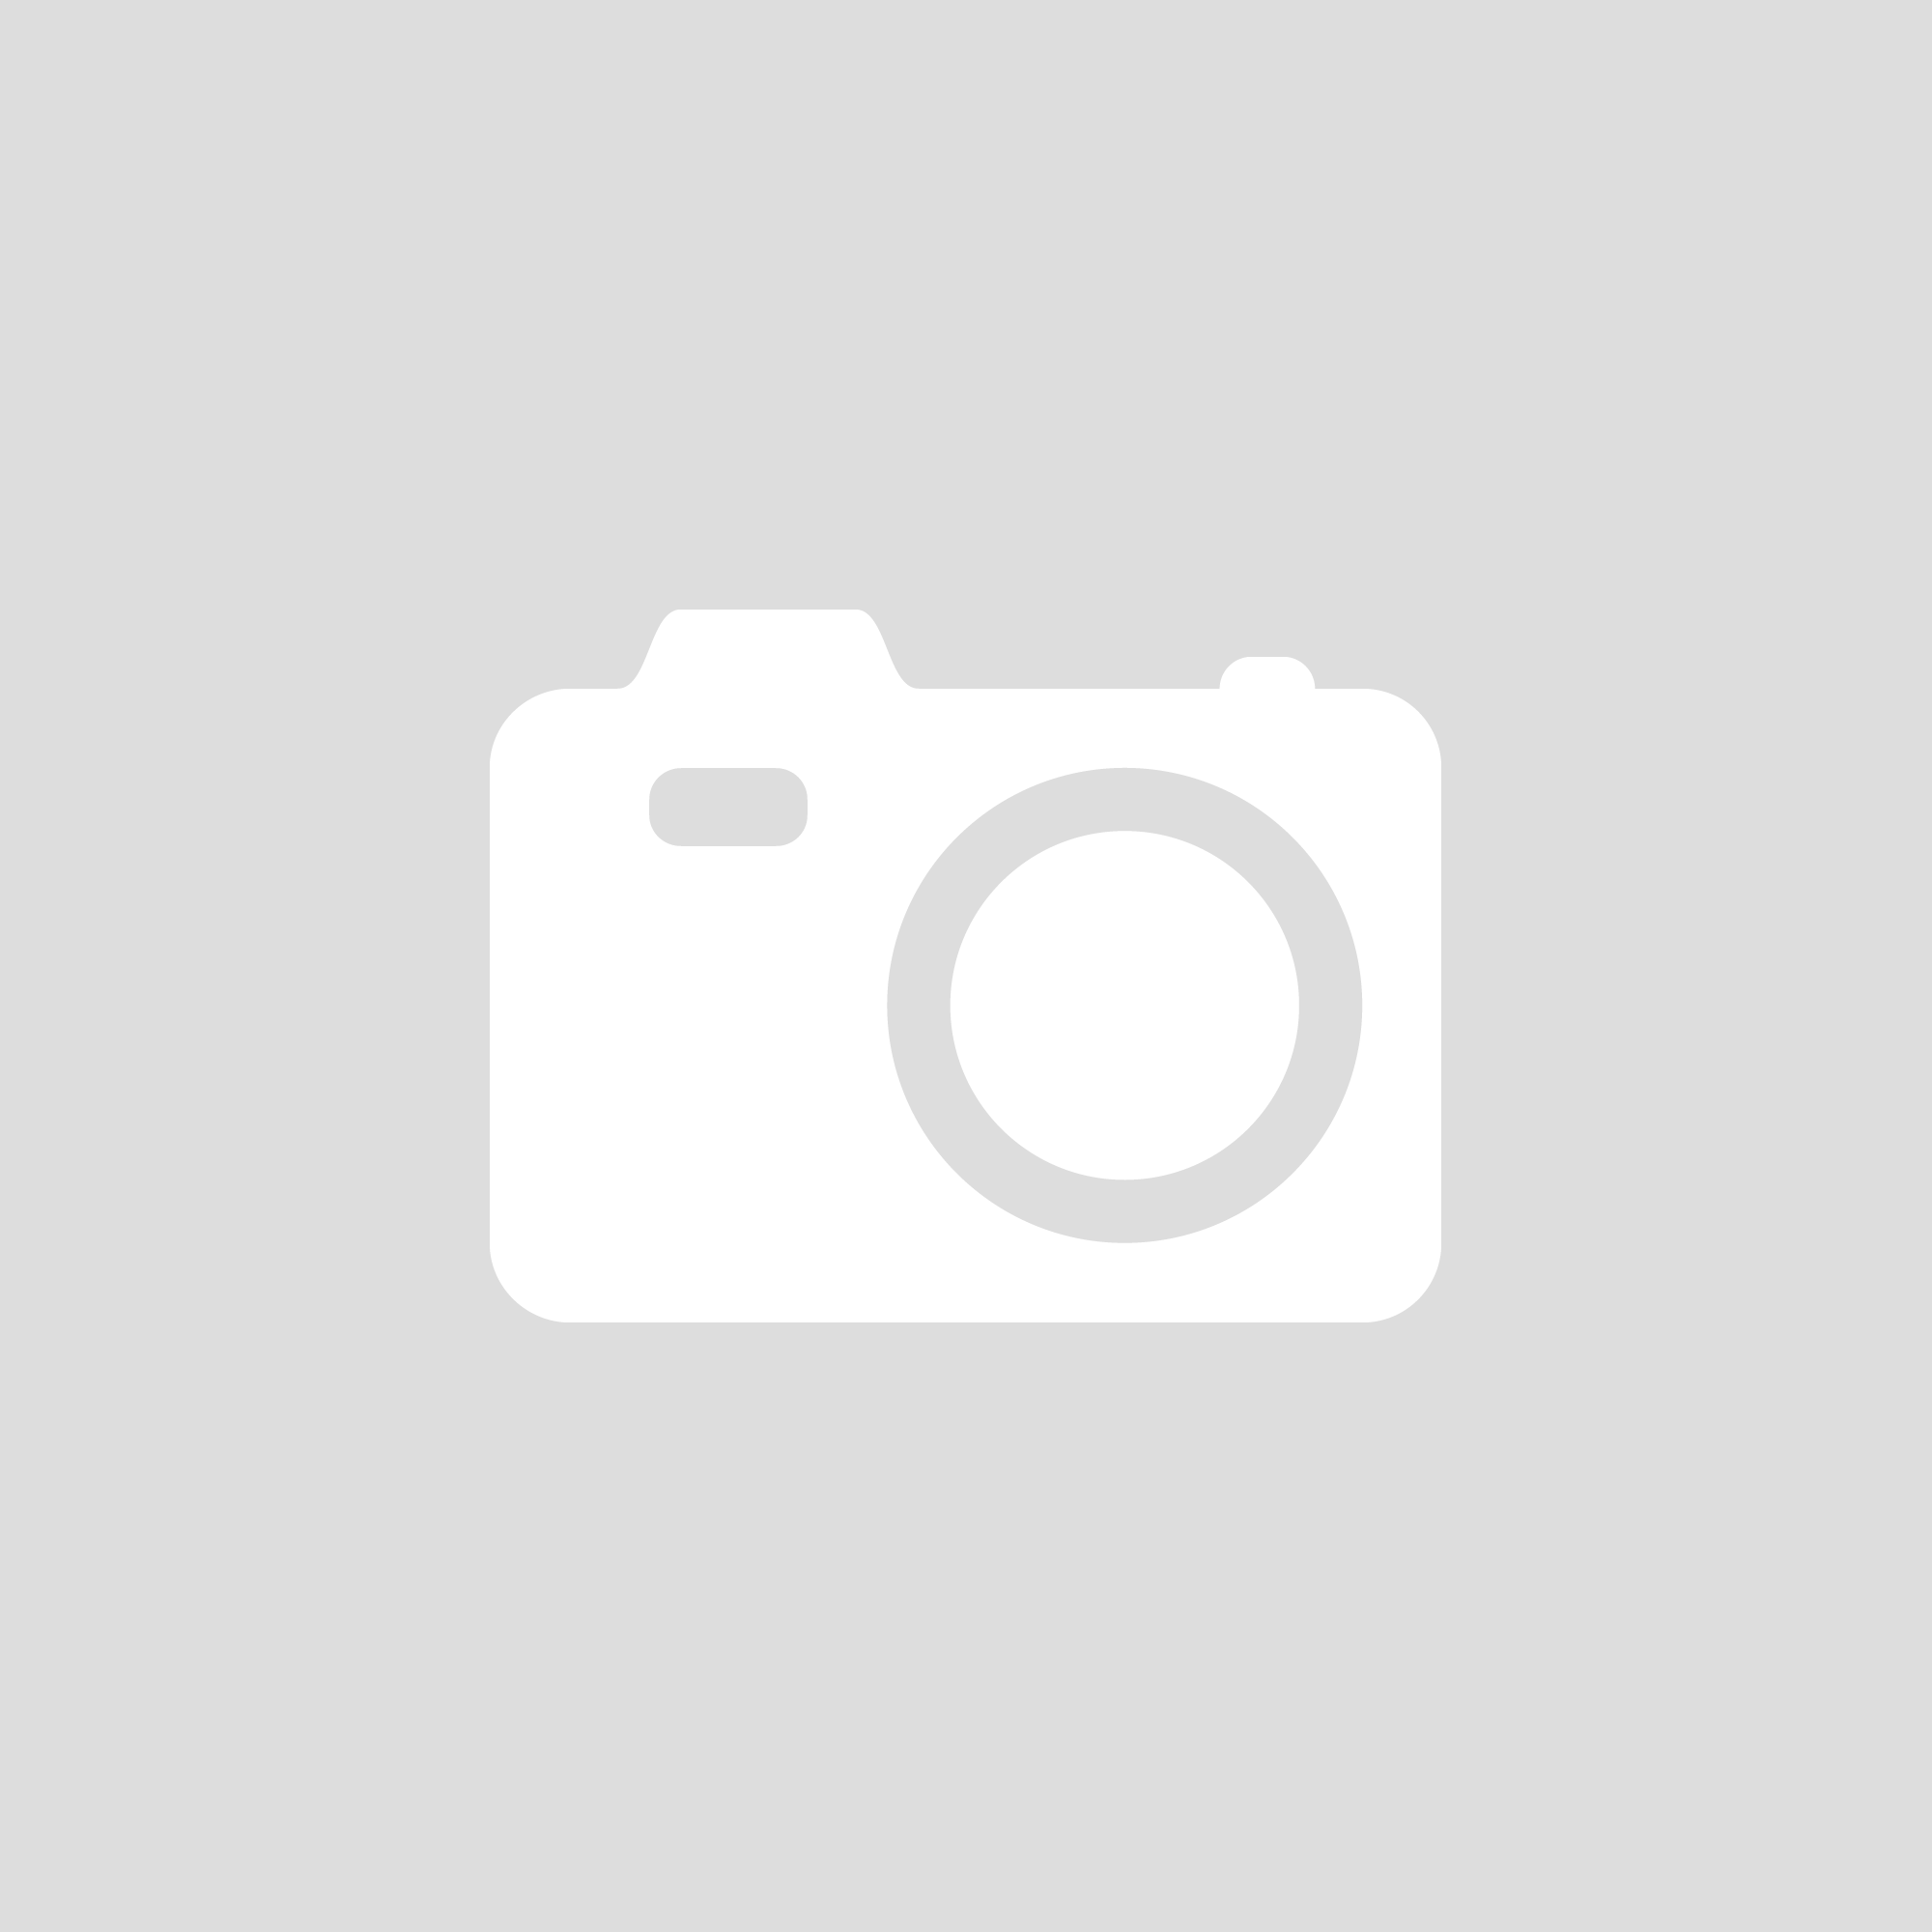 Royal Palm Red / Gold Wallpaper by Moda Black Label 57001